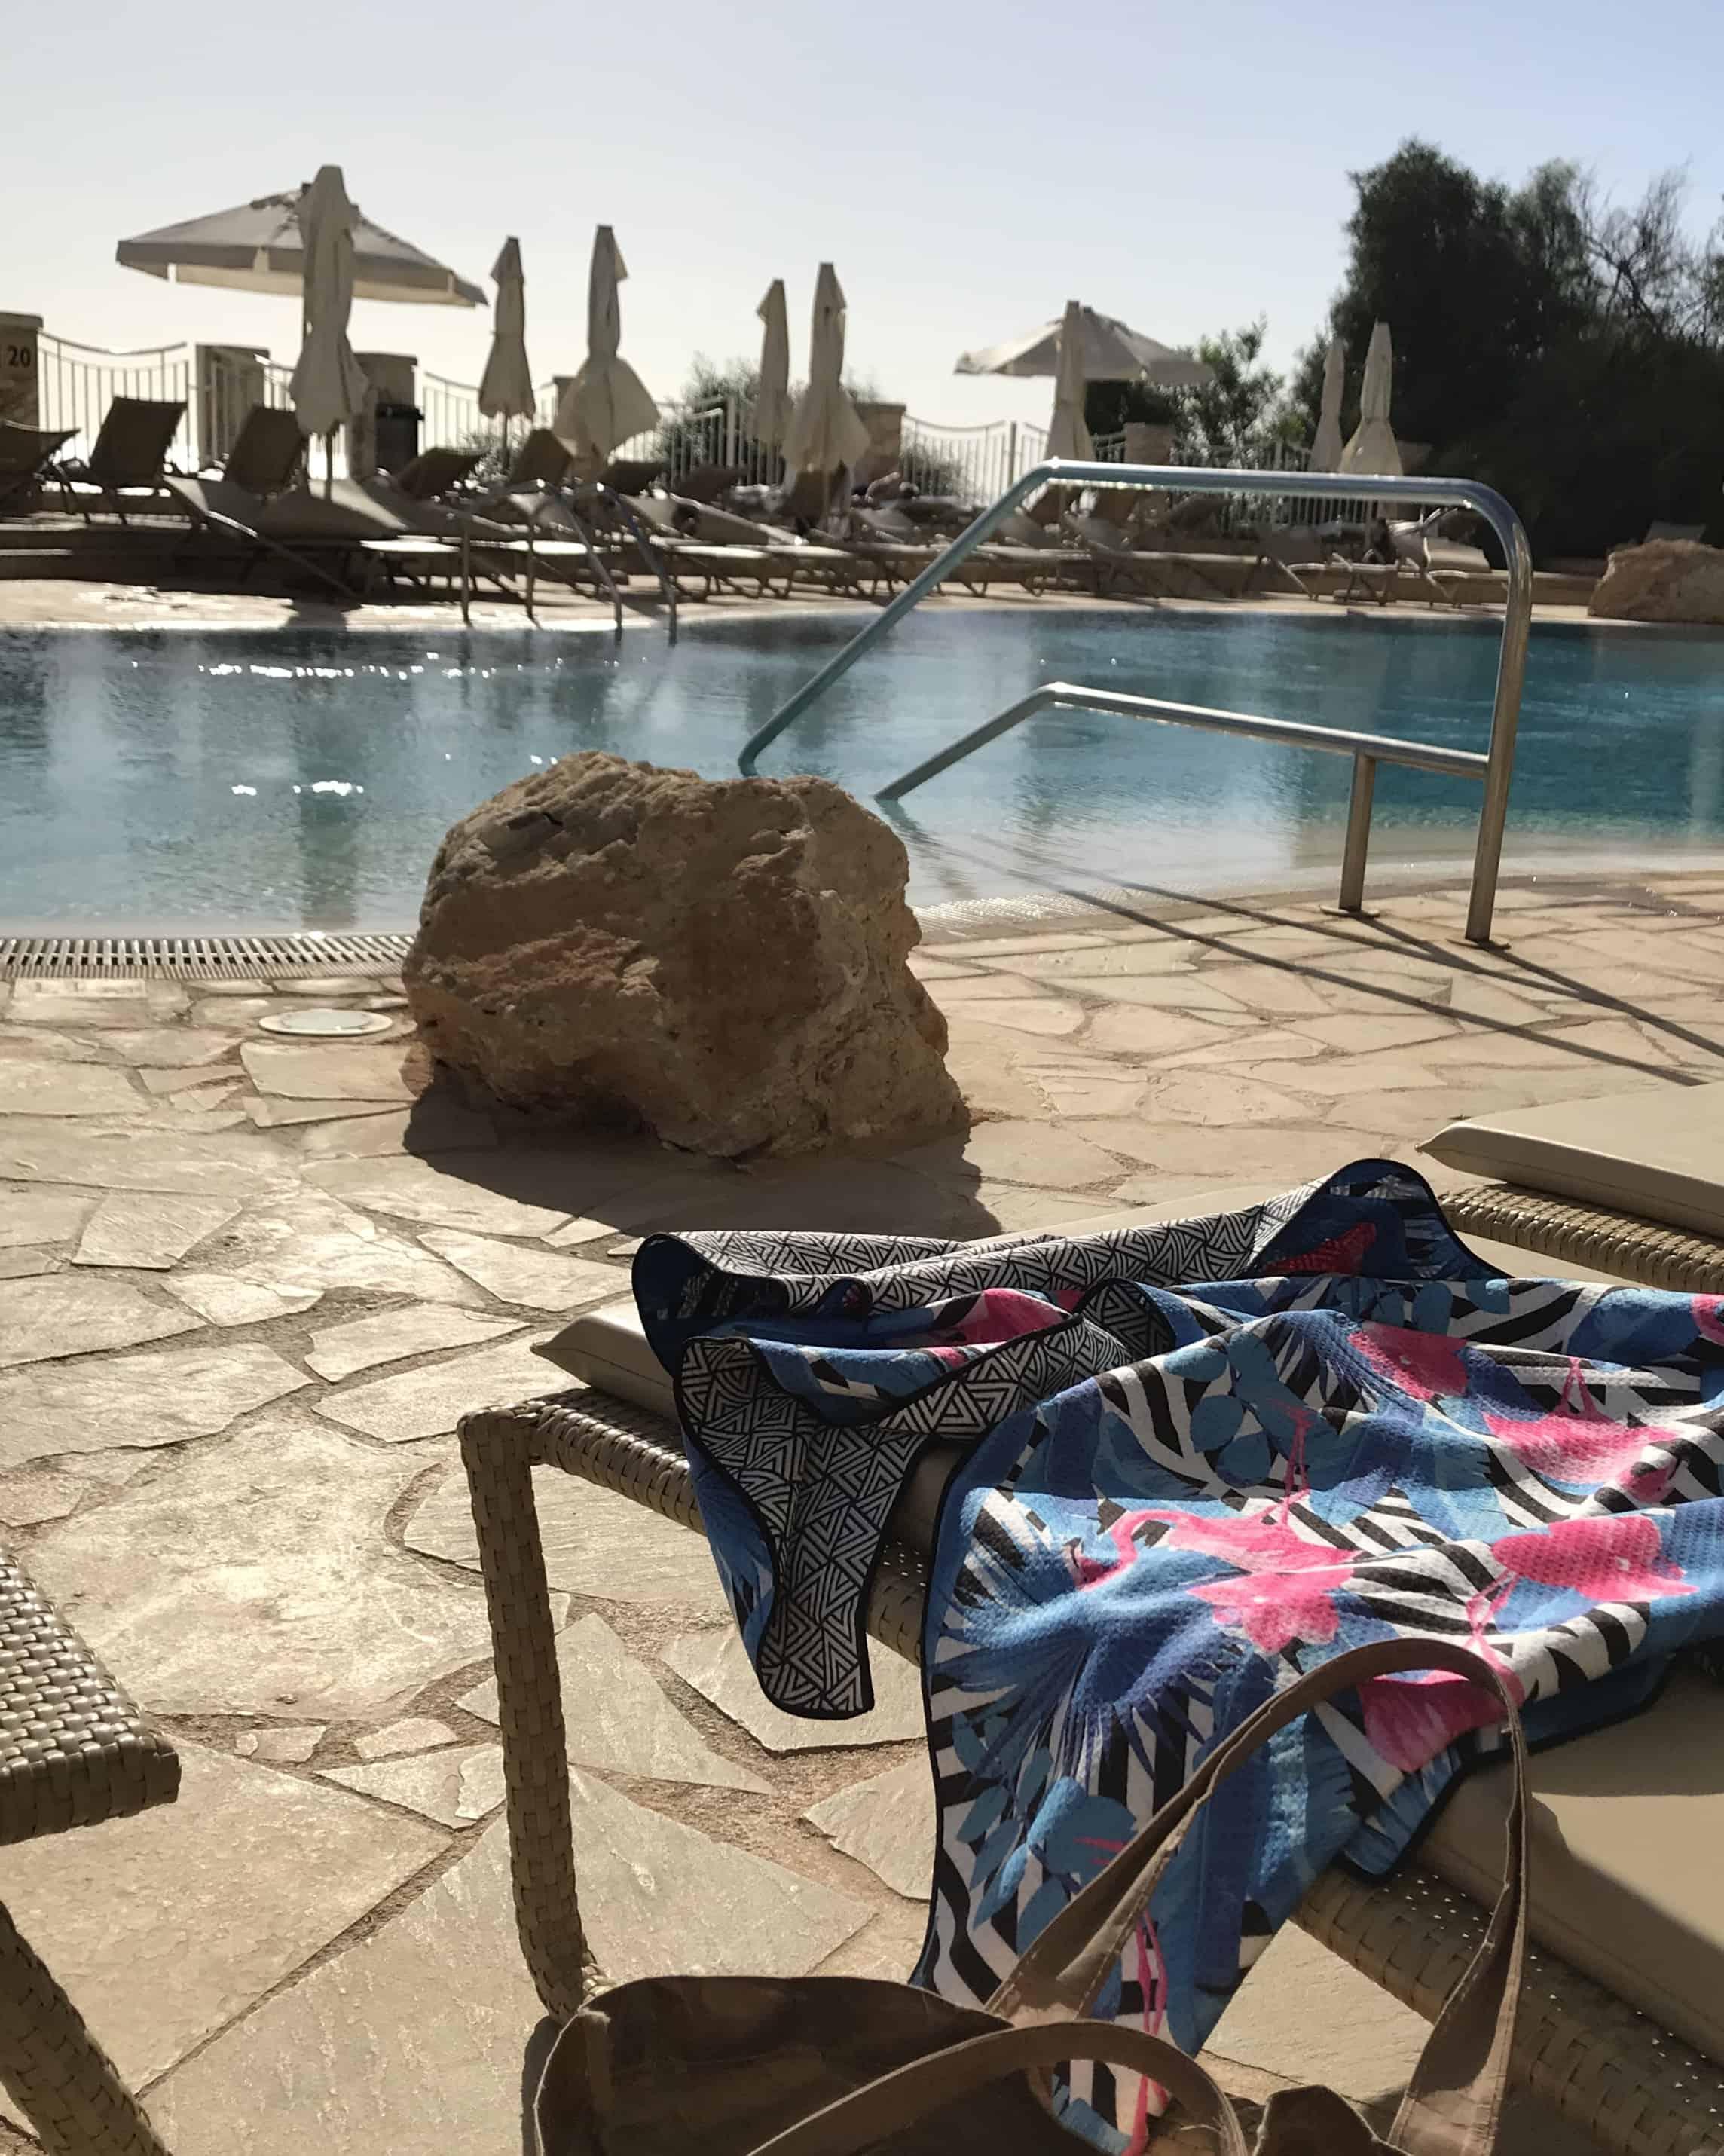 Poolside with a Tesalate beach towel